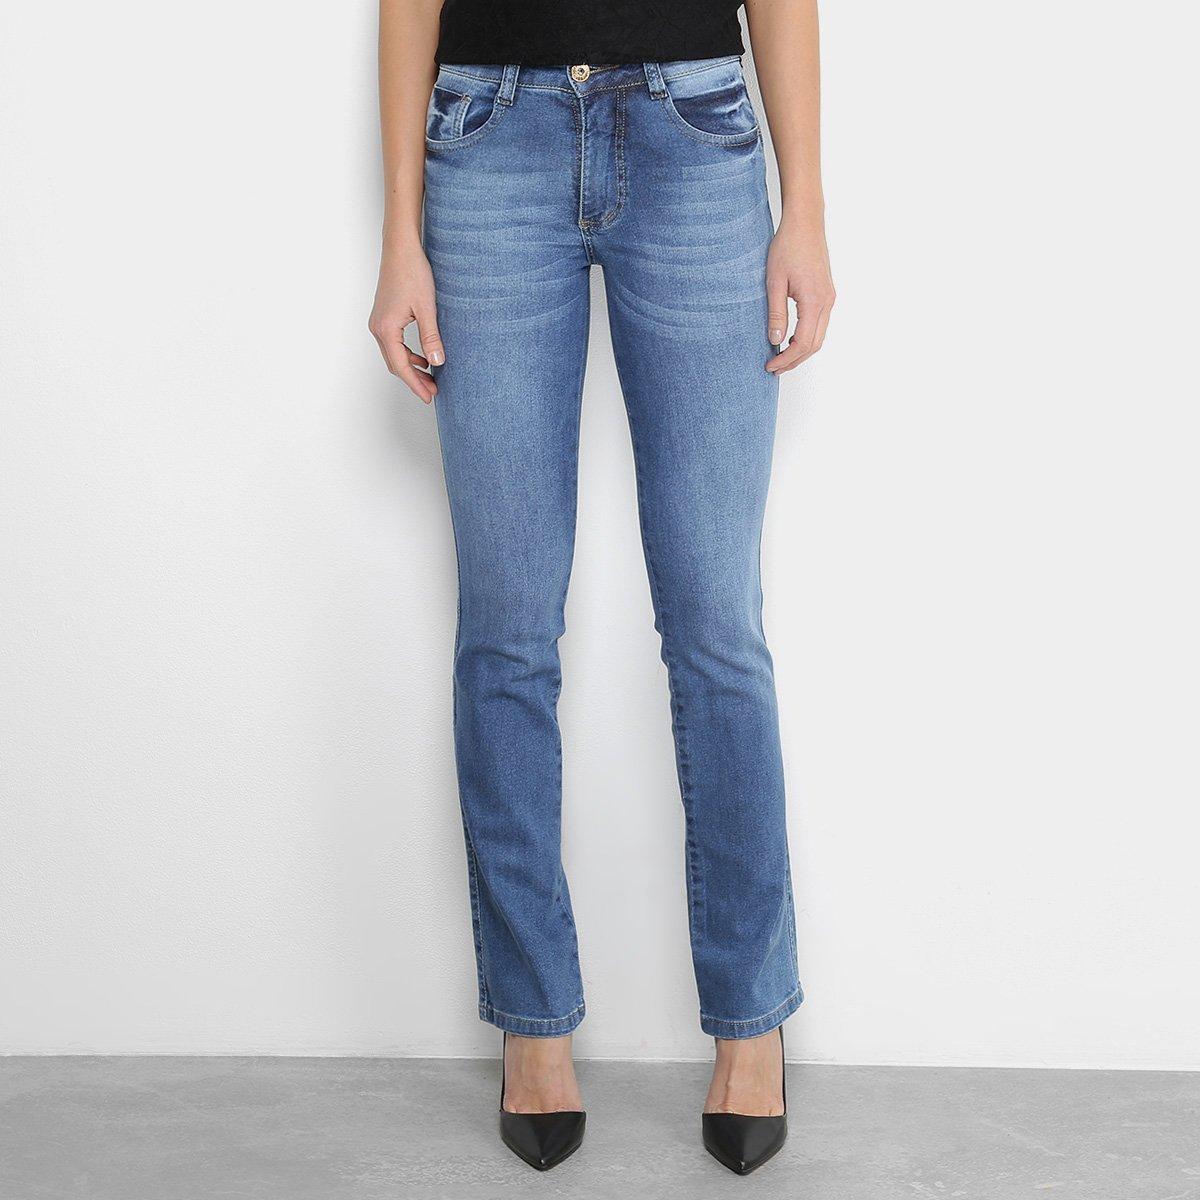 ff1d23785 Calça Jeans Biotipo Reta Feminina